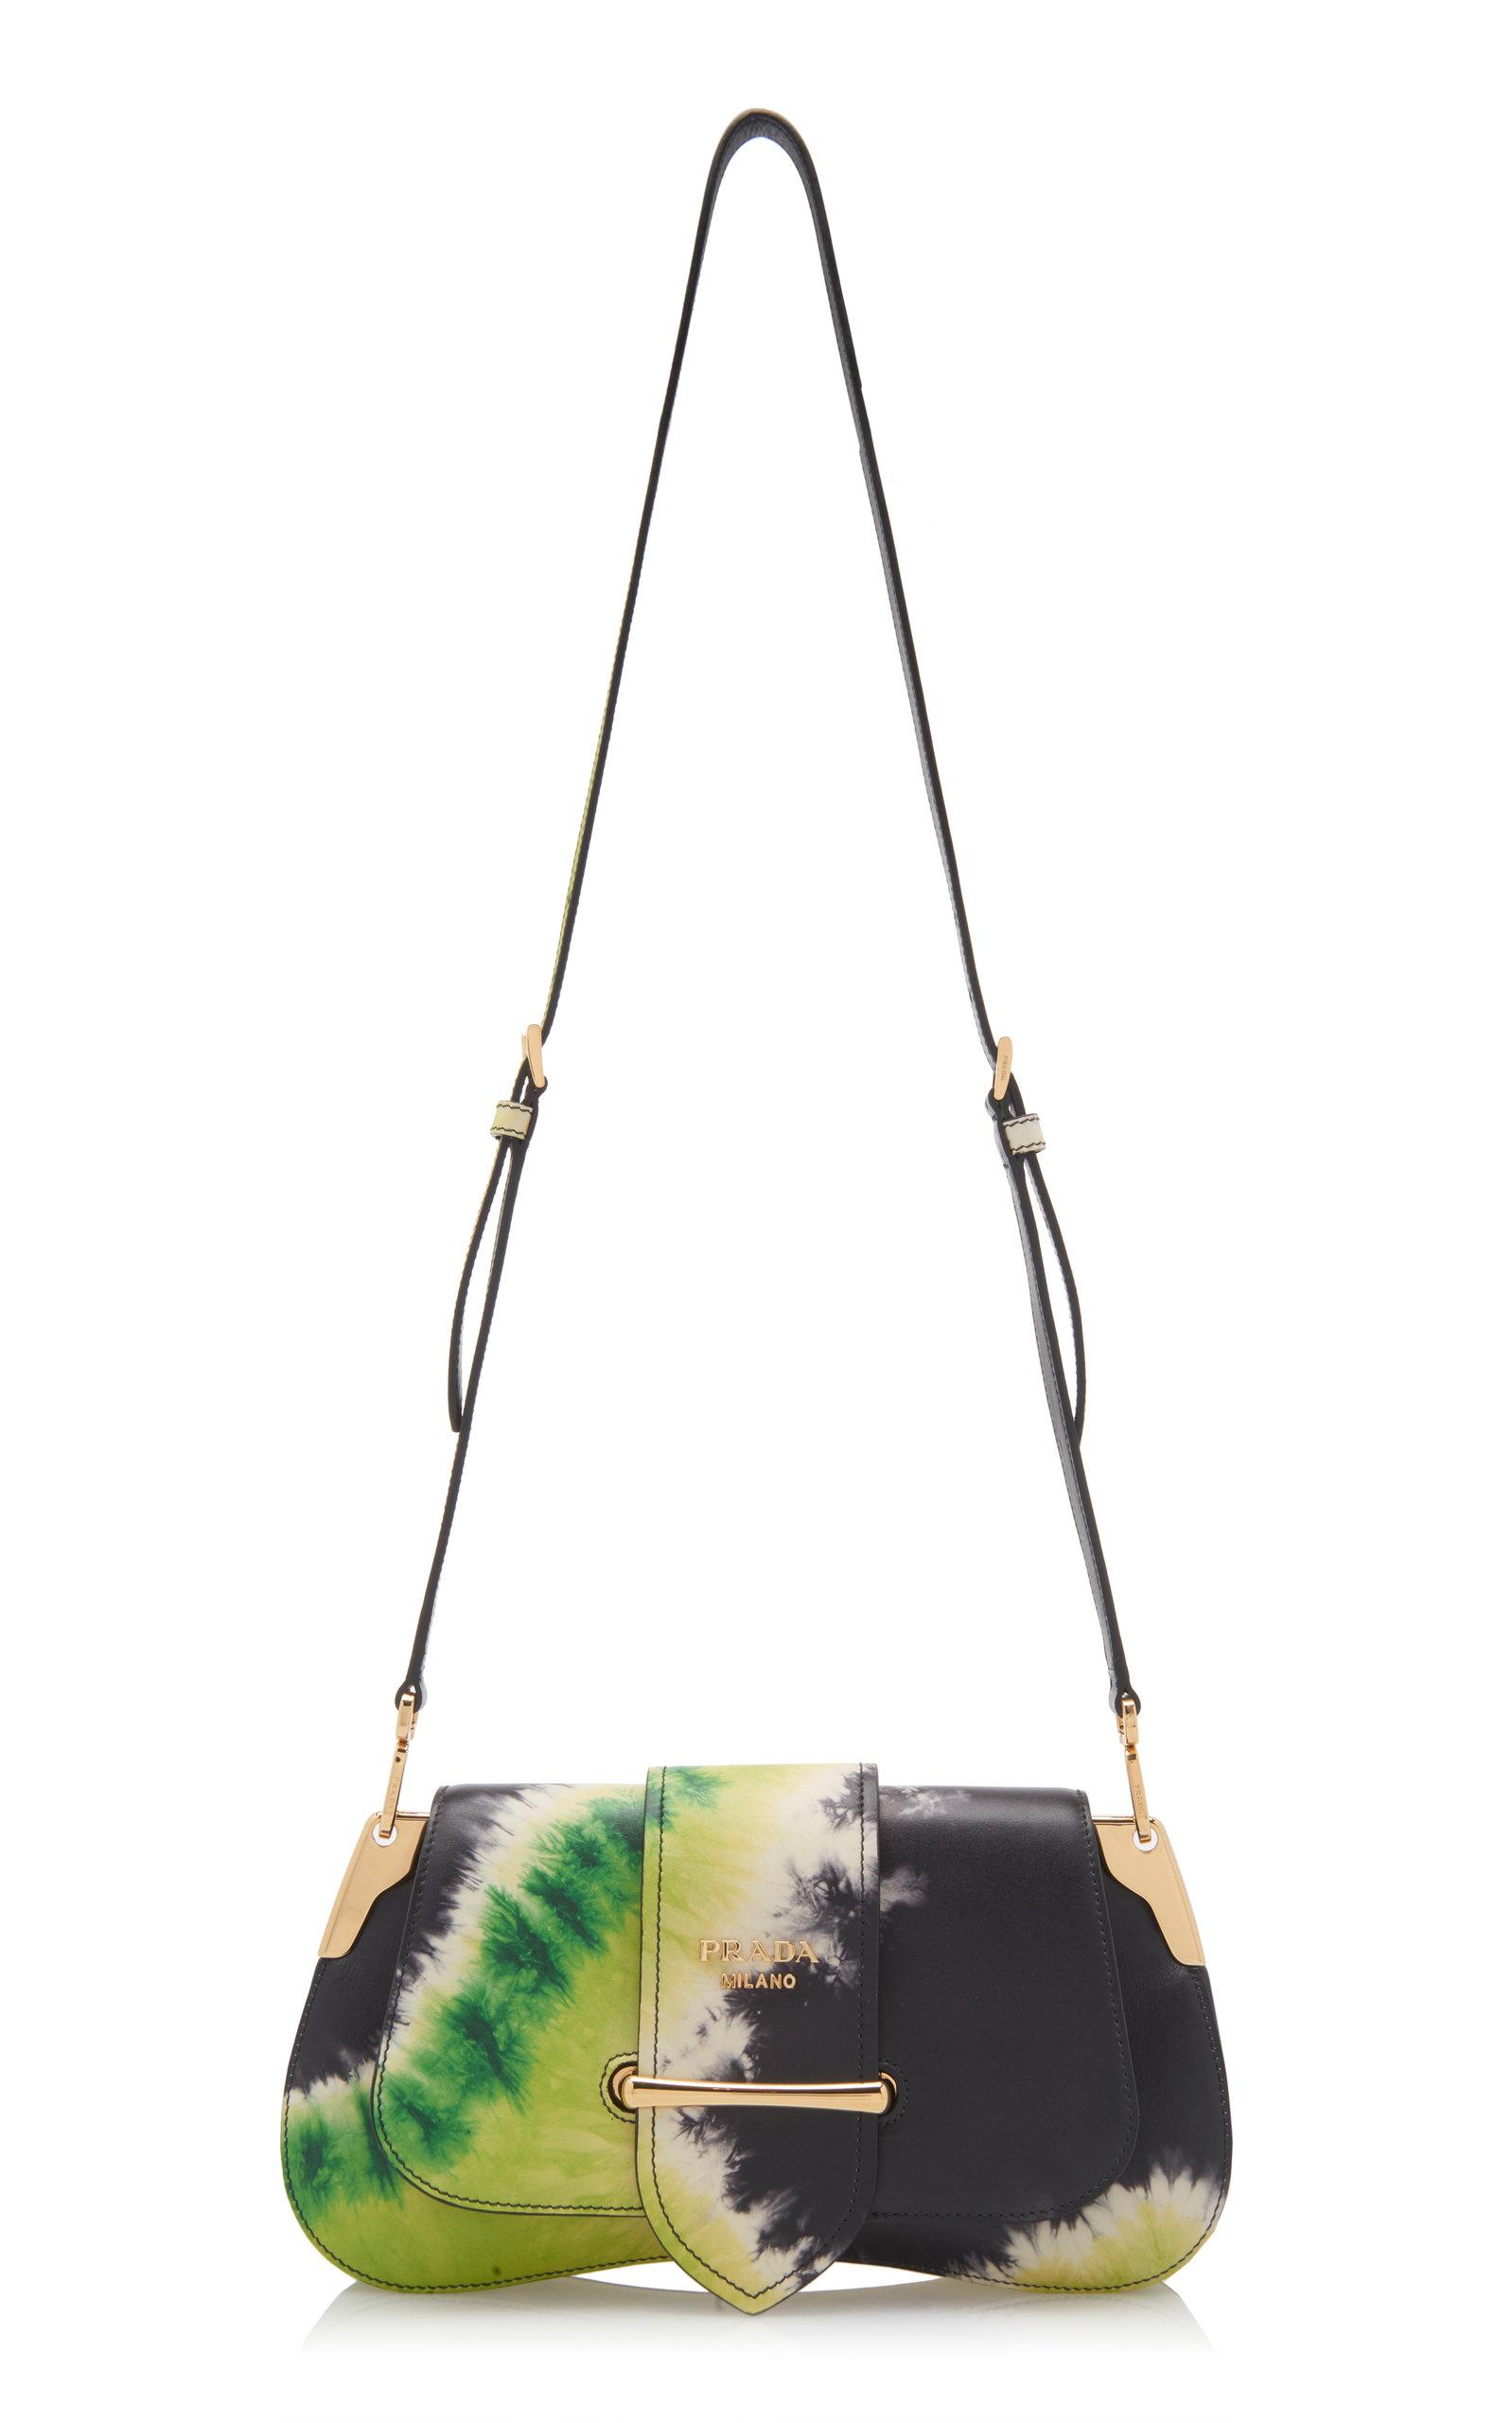 8c7ea4528312 Pattina Tie-Dye Leather Shoulder Bag by Prada   Moda Operandi